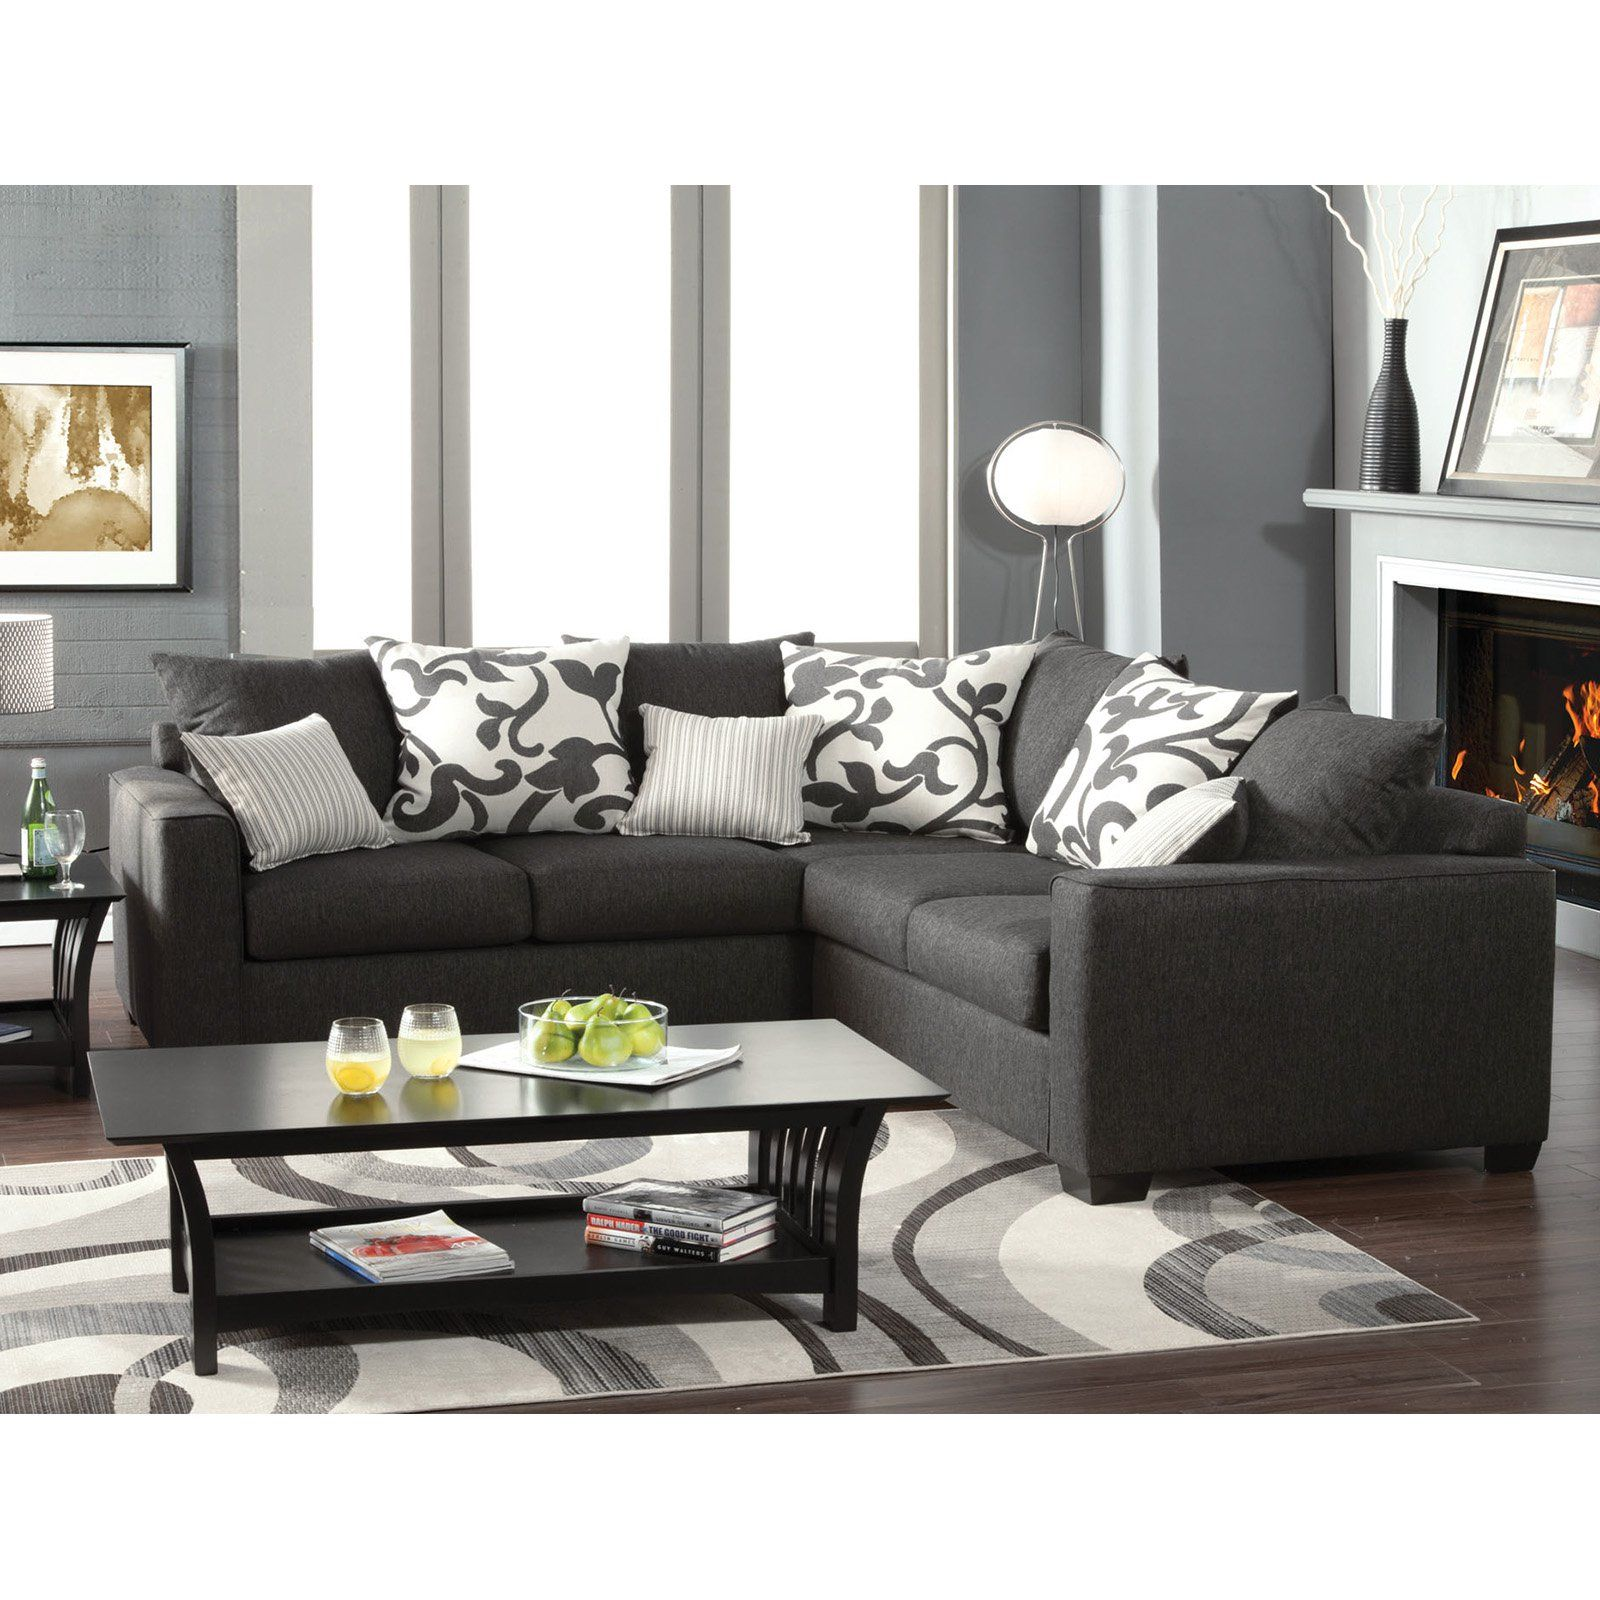 Furniture Of America Lleida 2 Piece Fabric Sectional Sofa